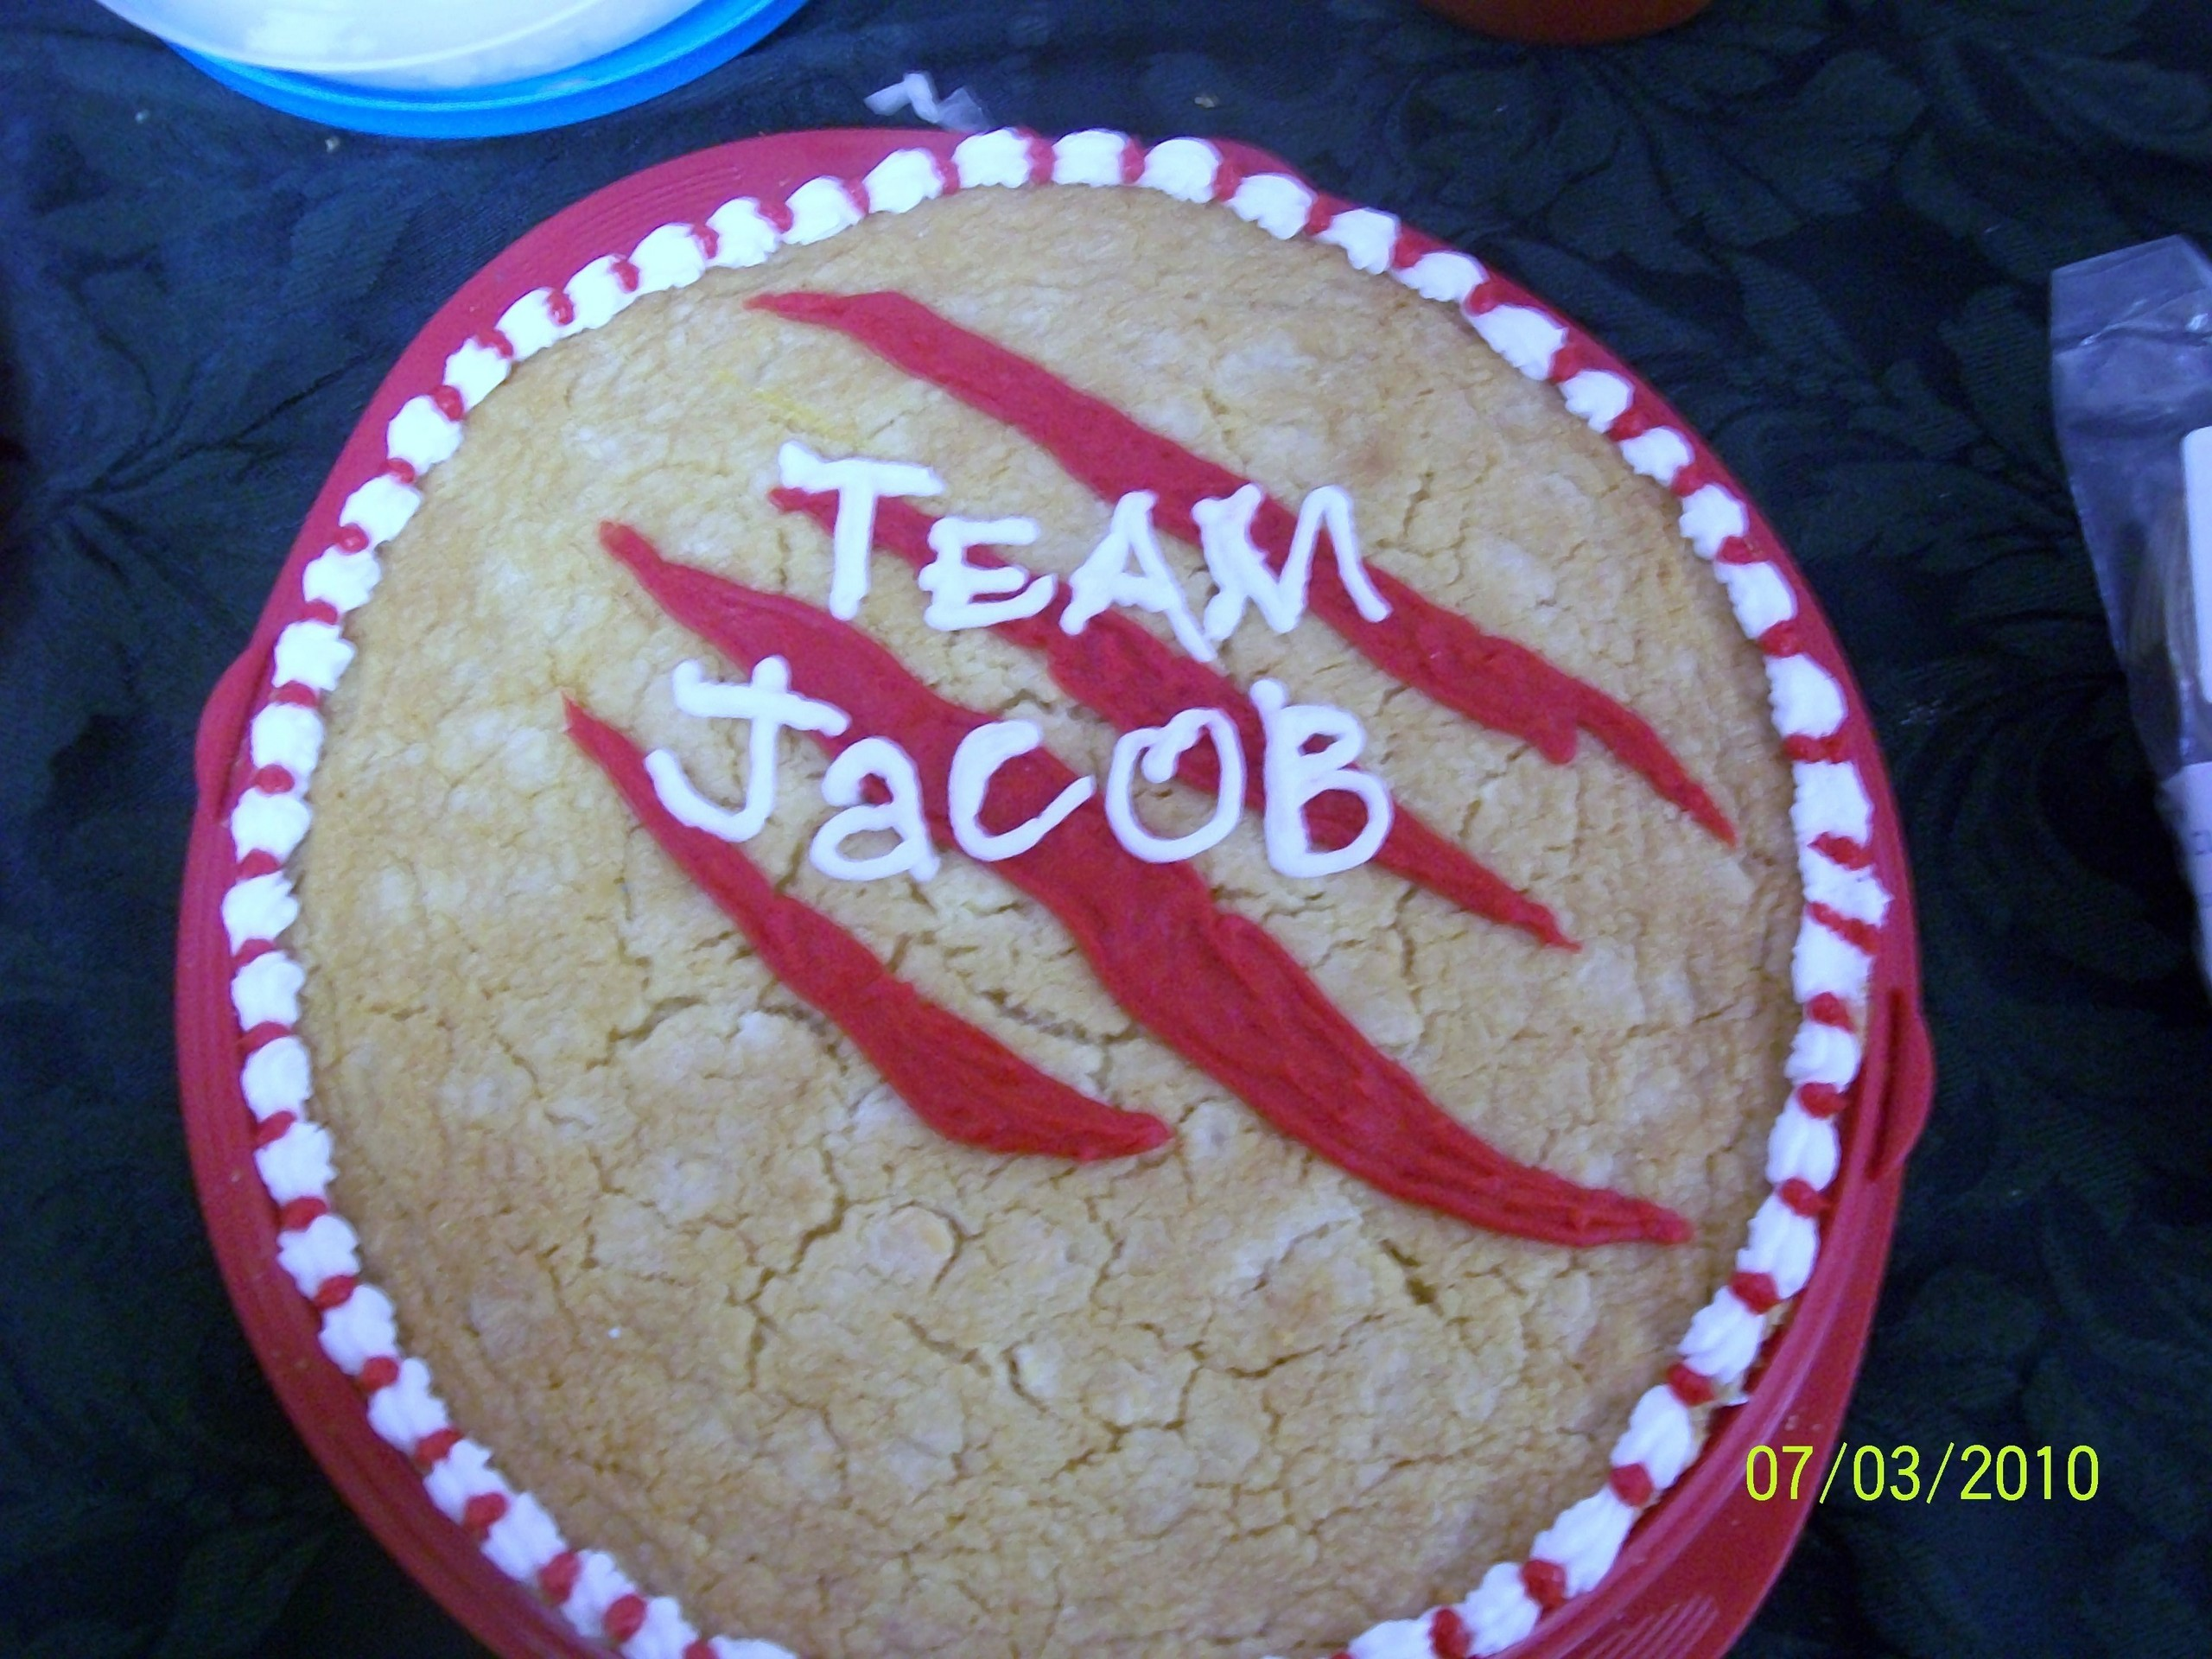 Jacob Black New Moon Cake